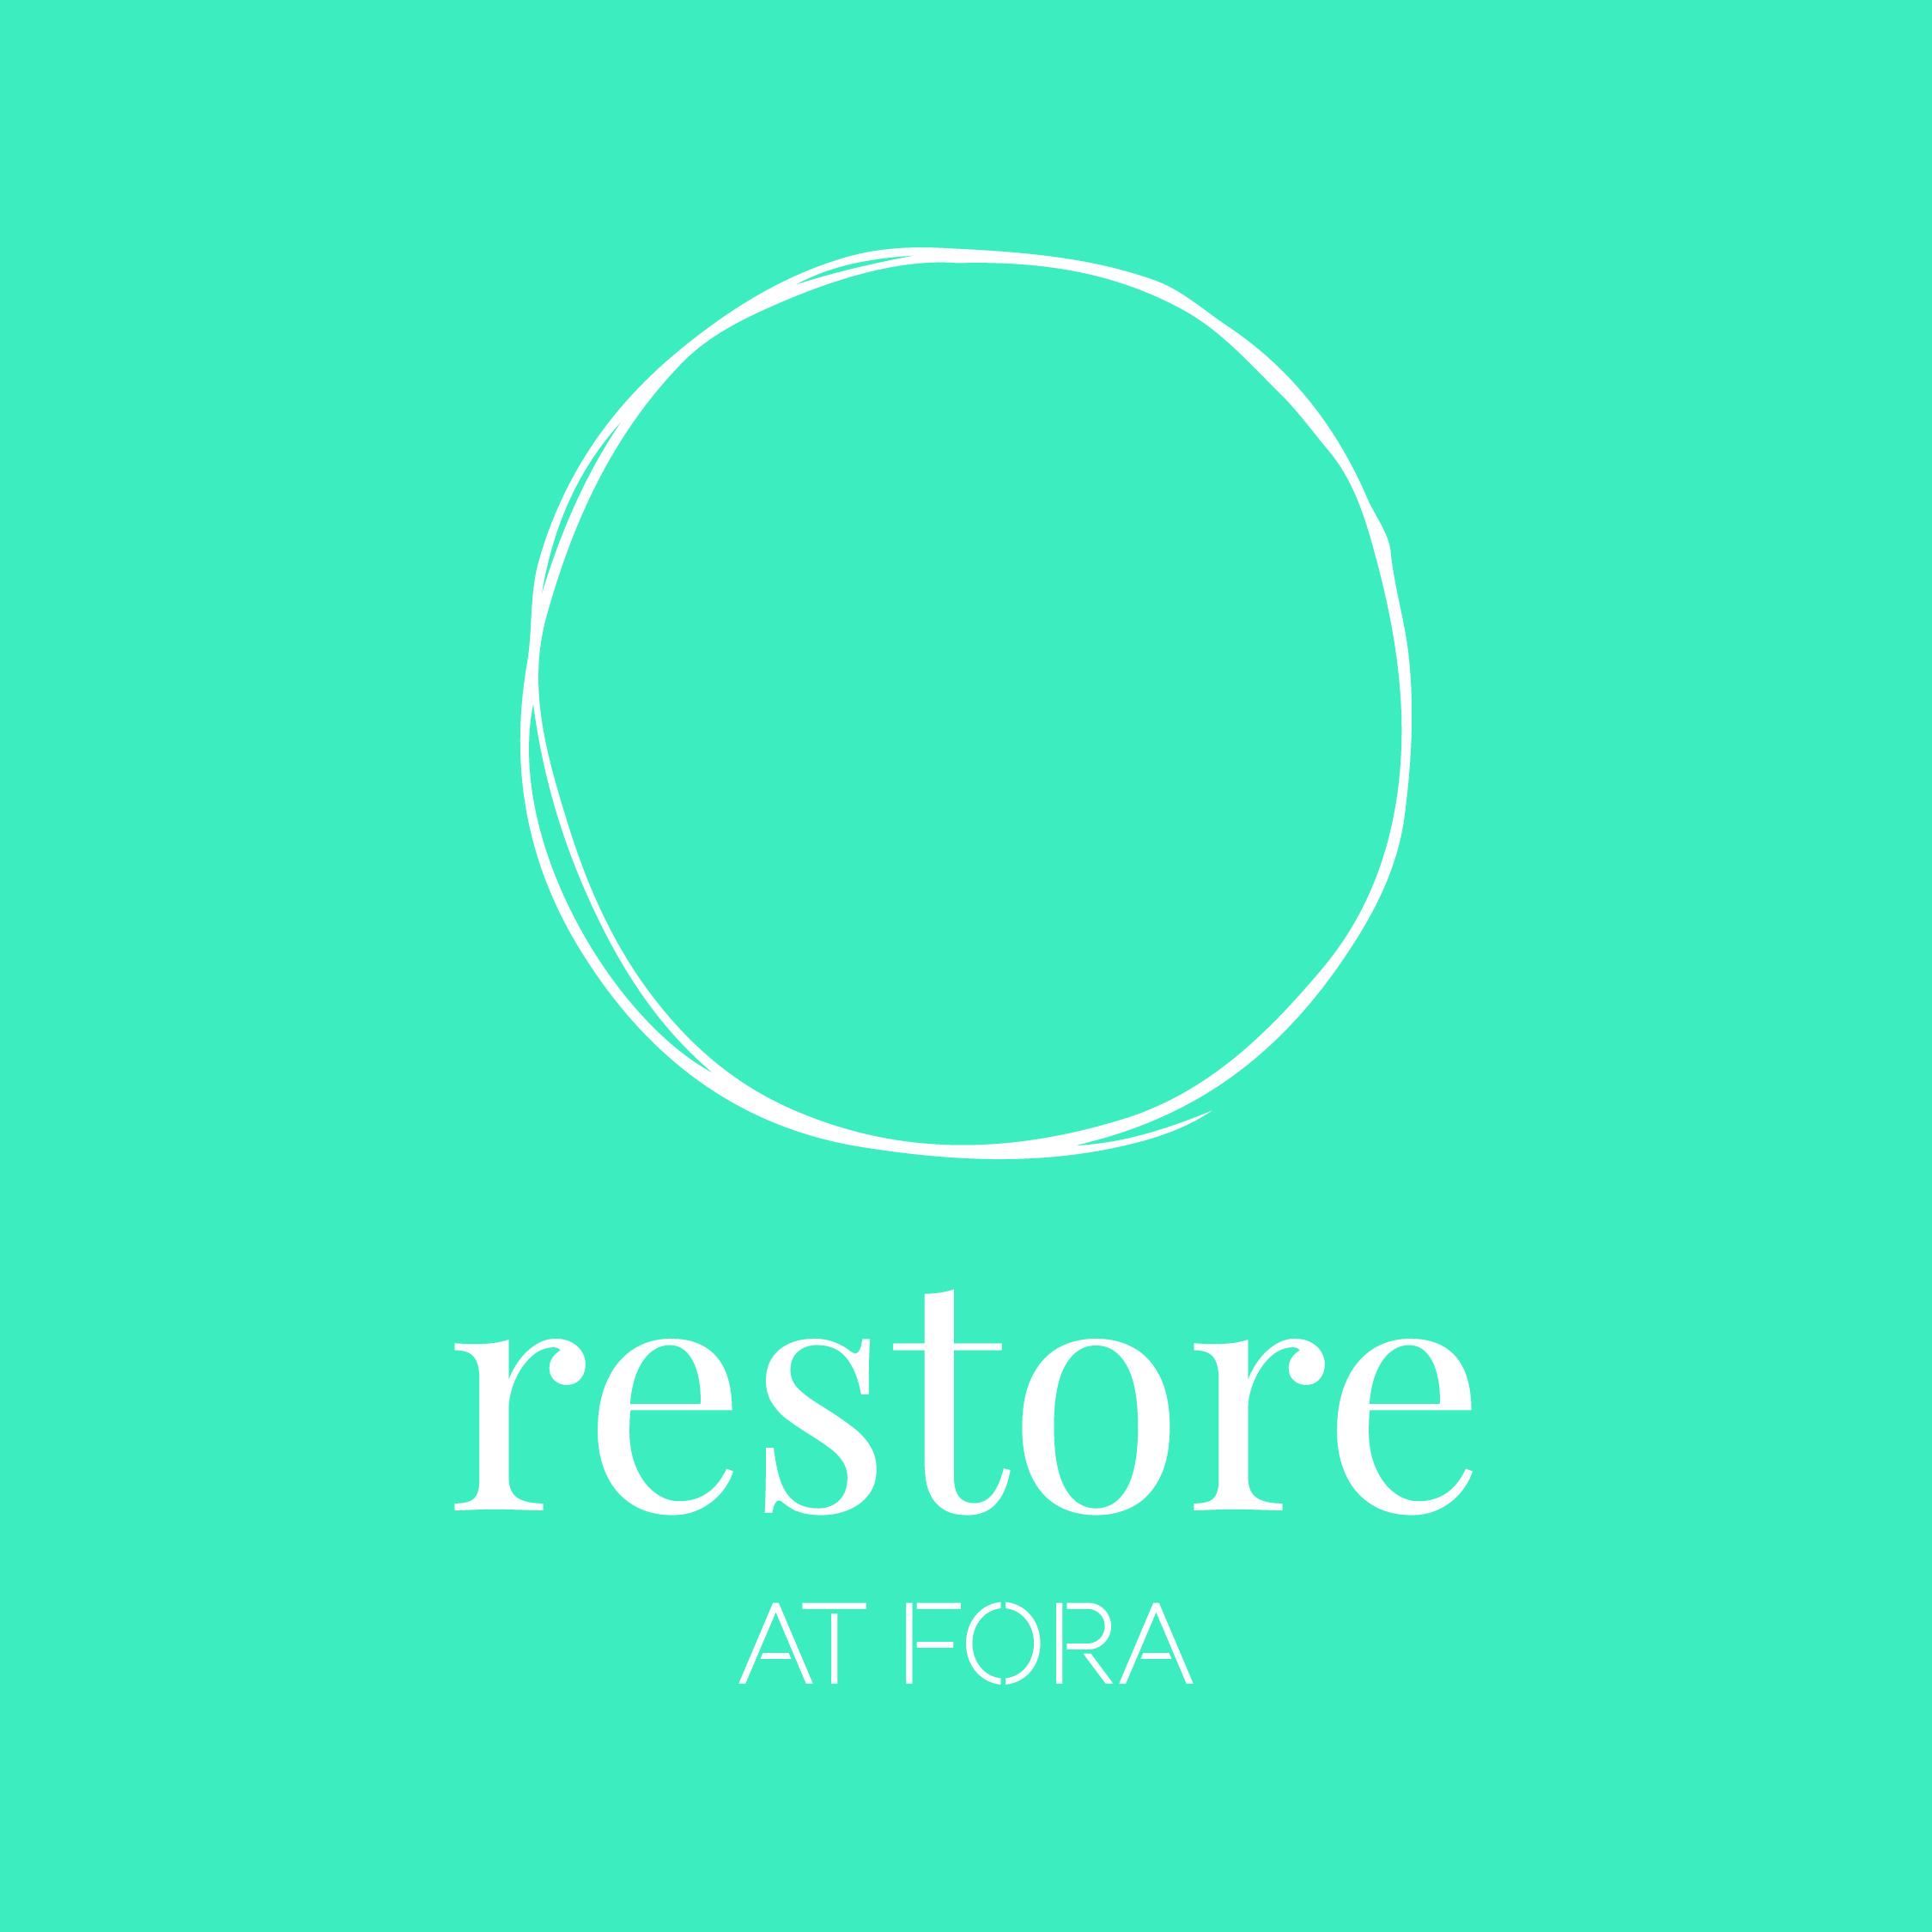 RESTORE at FORA